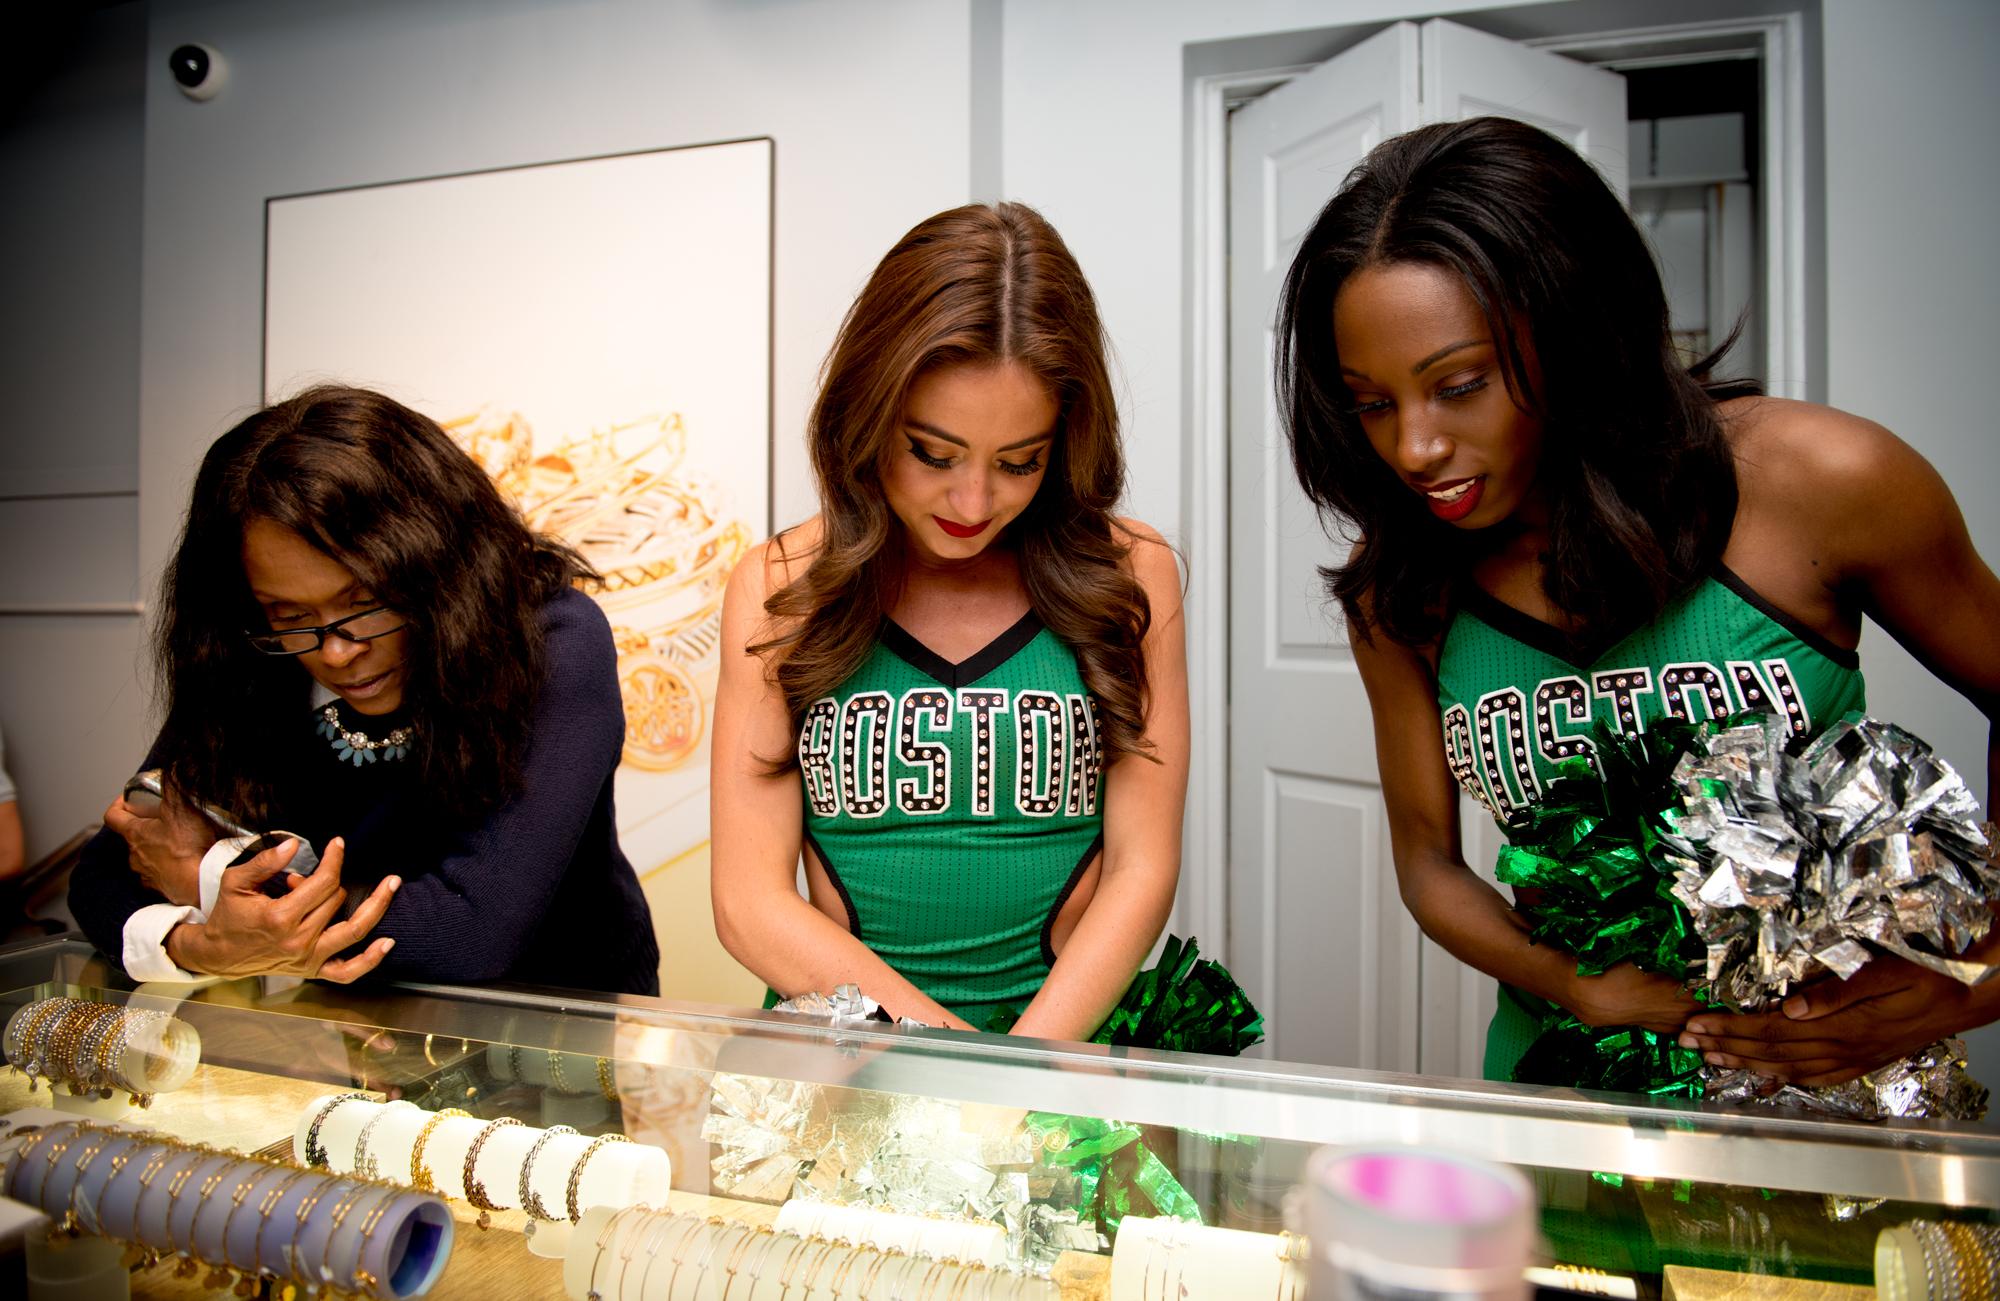 Celtics_Alex_Ani_032916-101.jpg